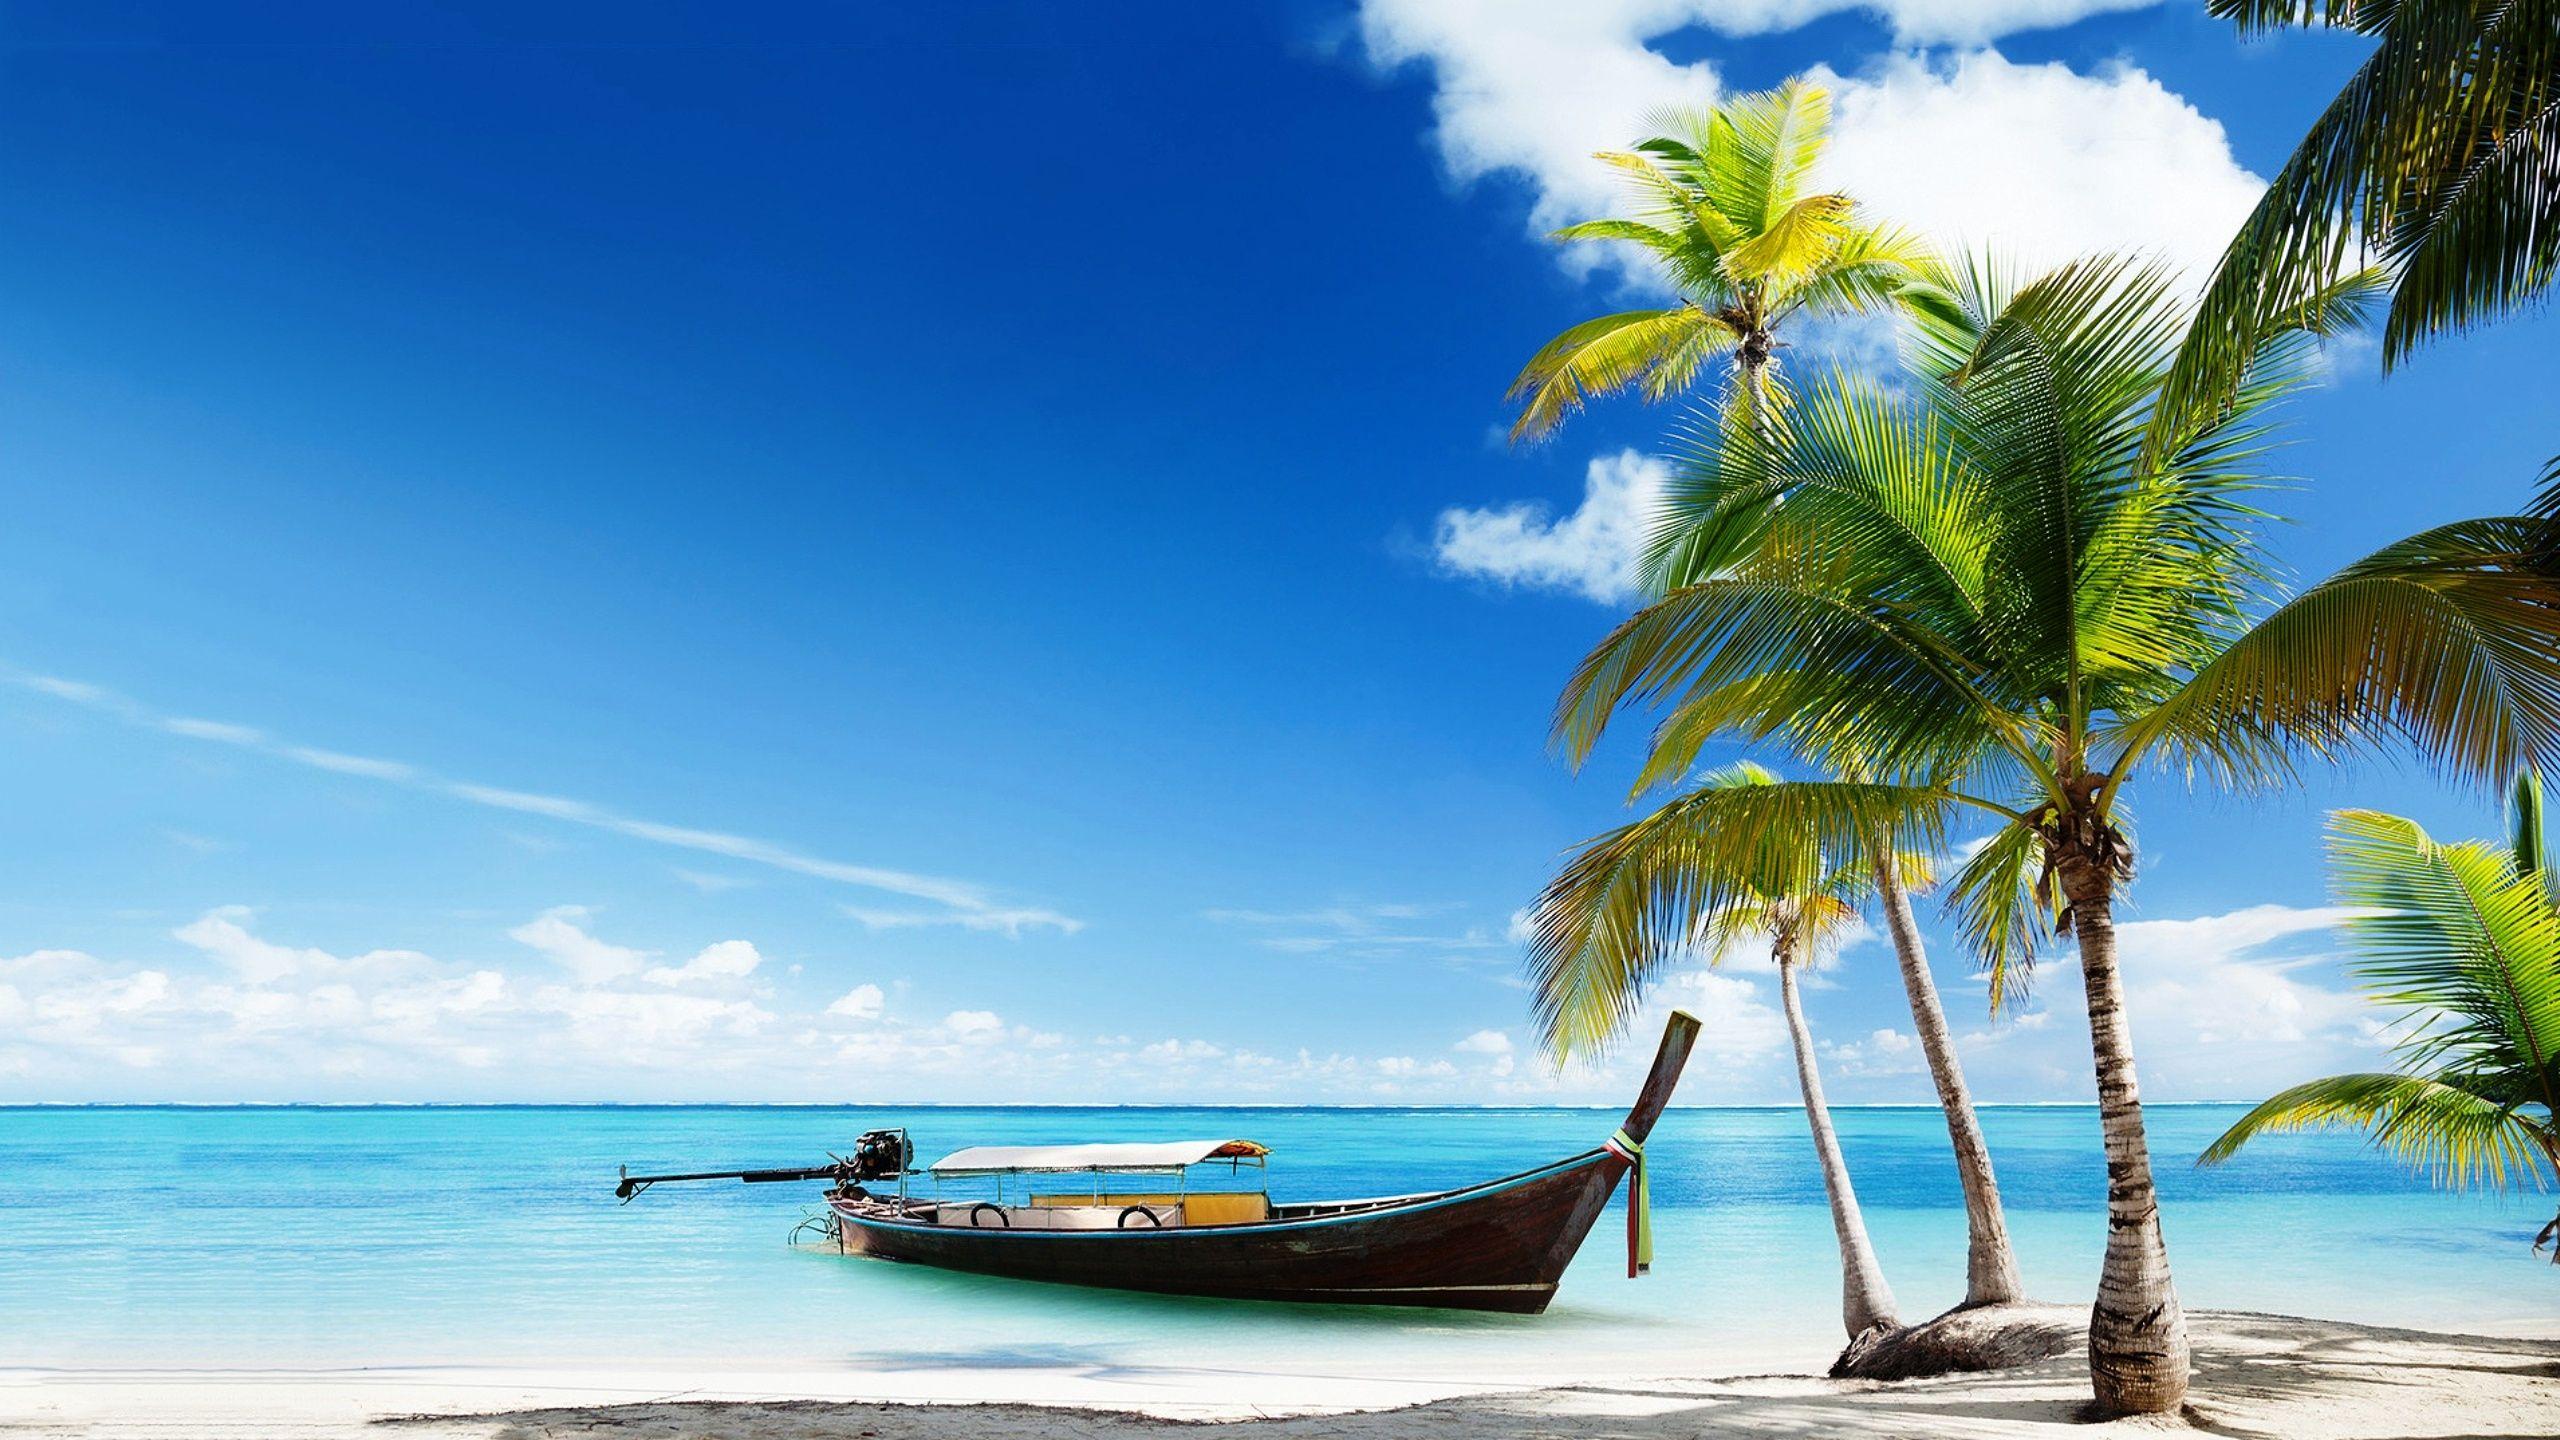 Boat Tropical Beach Wallpaper Jpg 2560 1440 Imagens De Praia Beach Pink Fotos De Leao